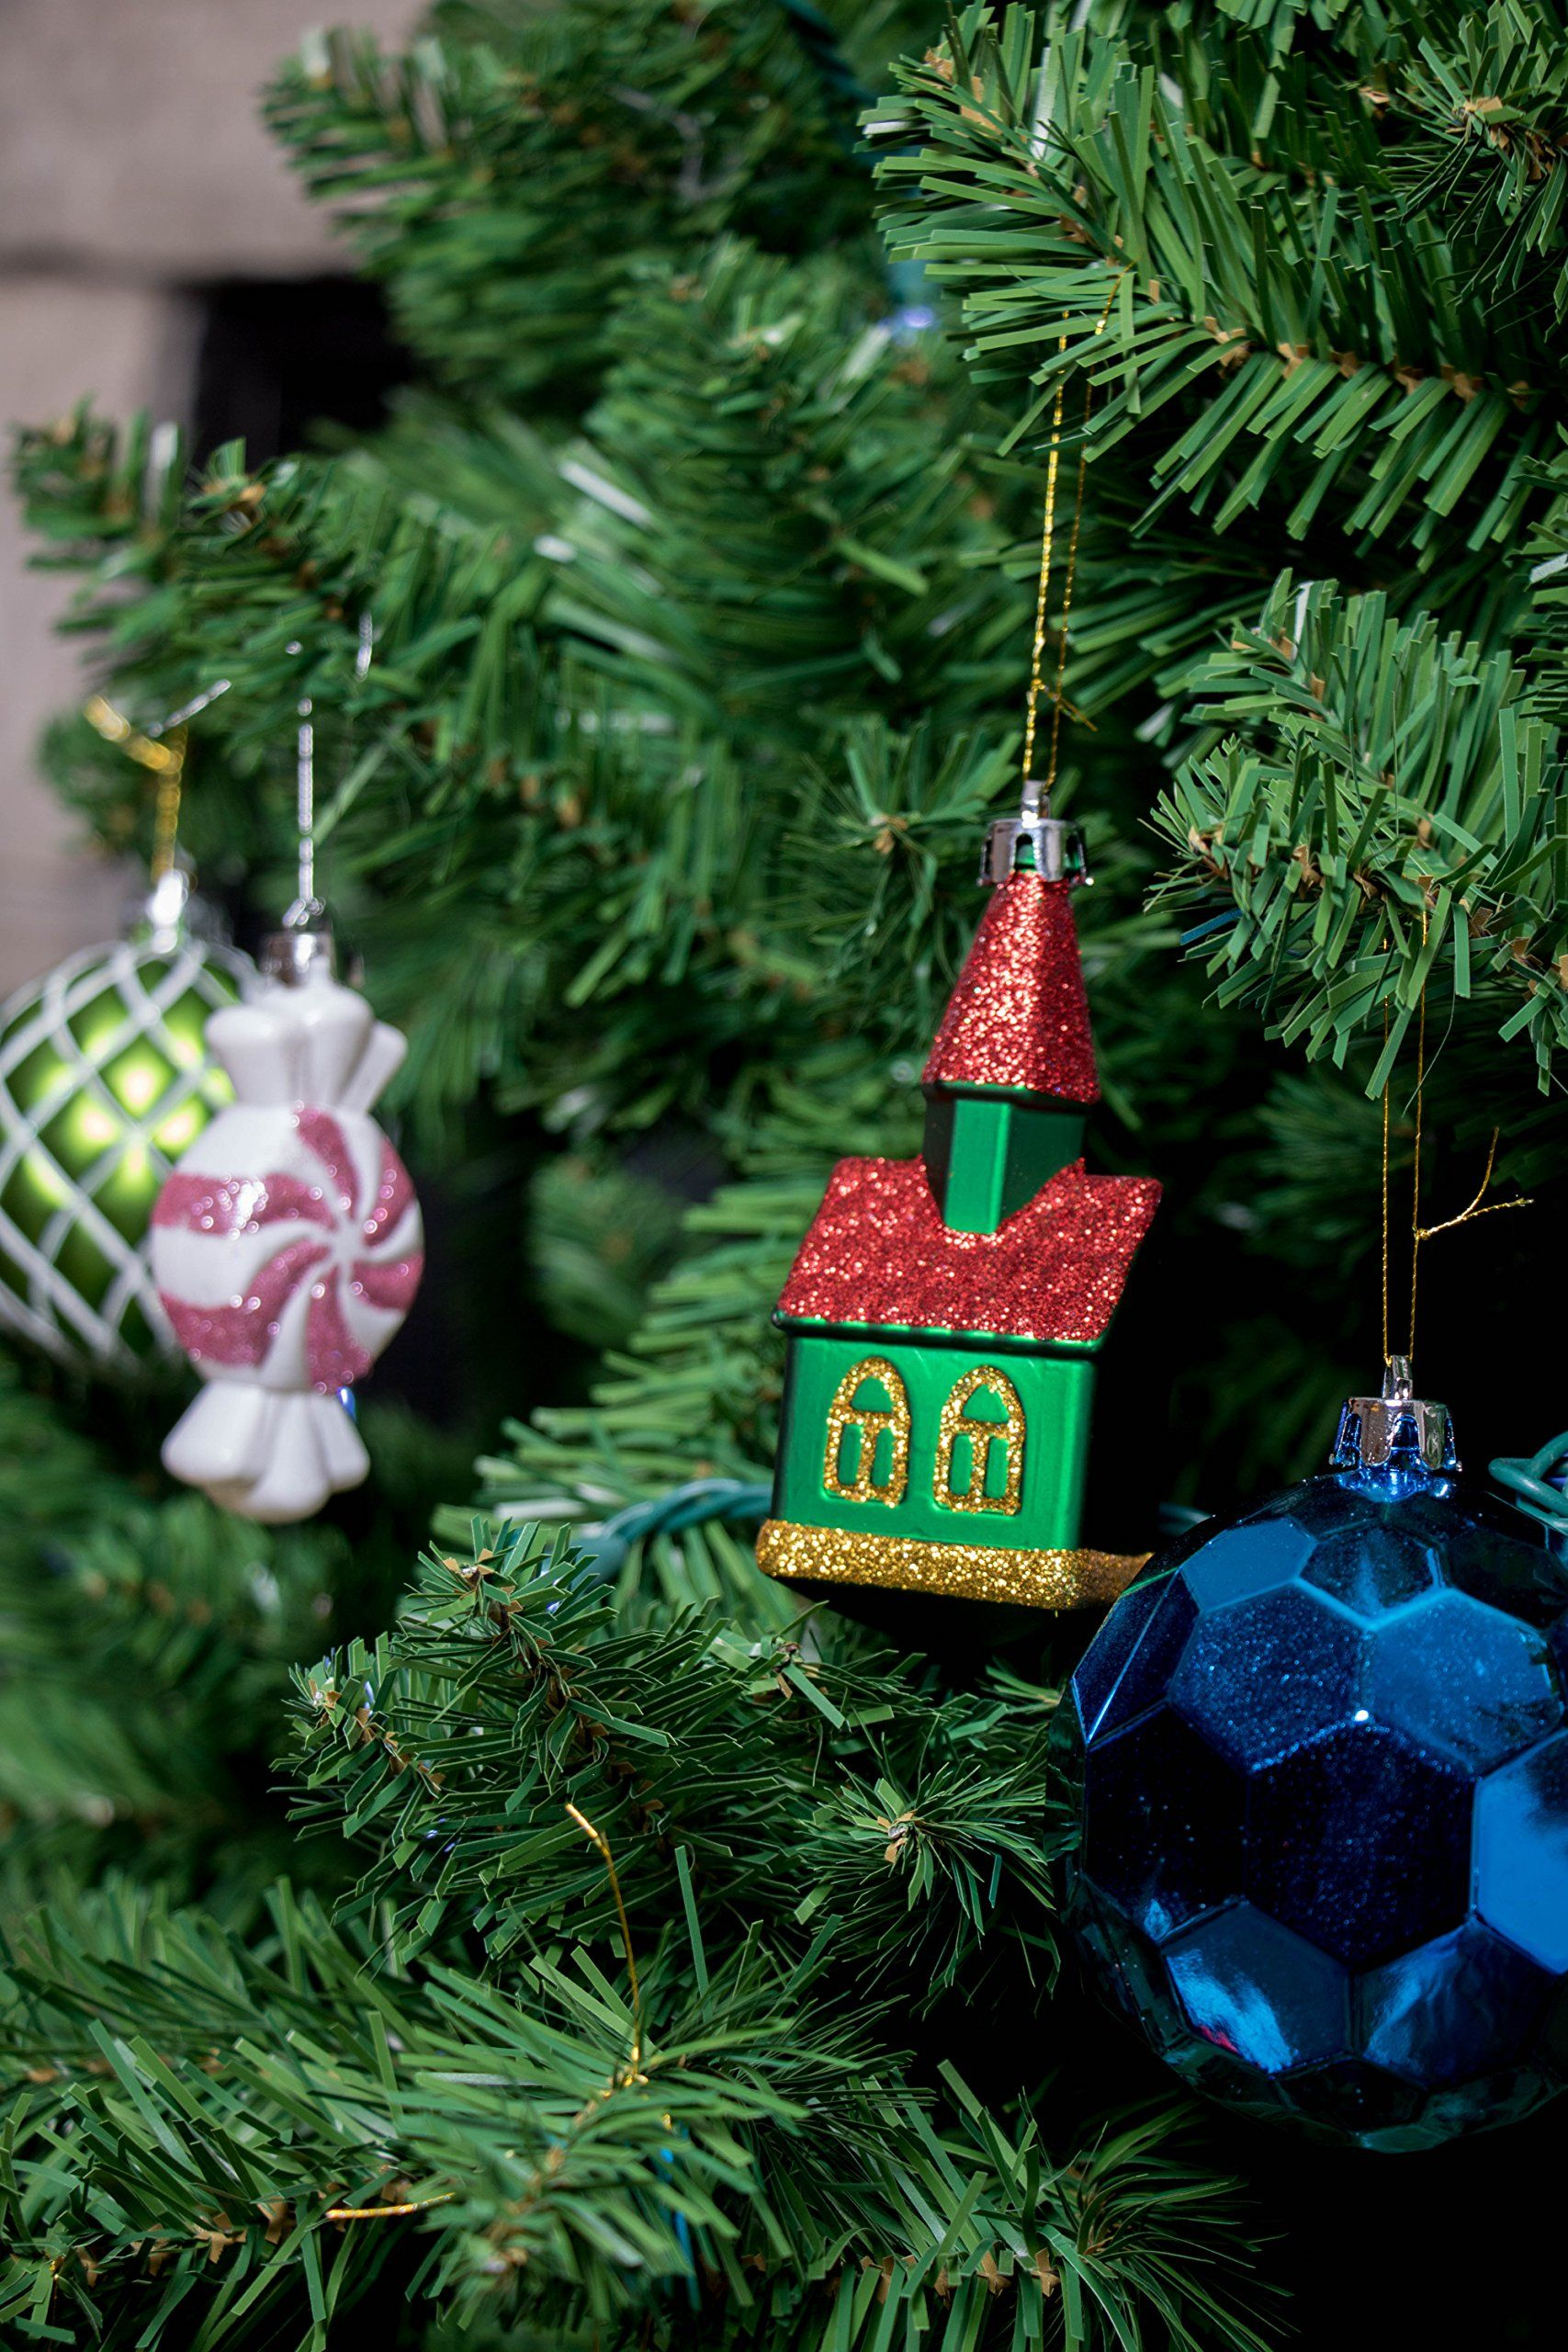 52 Piece Variety Bundle Shatterproof Christmas Tree Ornament Set 9 Shapes Trees Cupcakes Pepper Christmas Tree Ornaments Festive Holiday Decor Christmas Tree